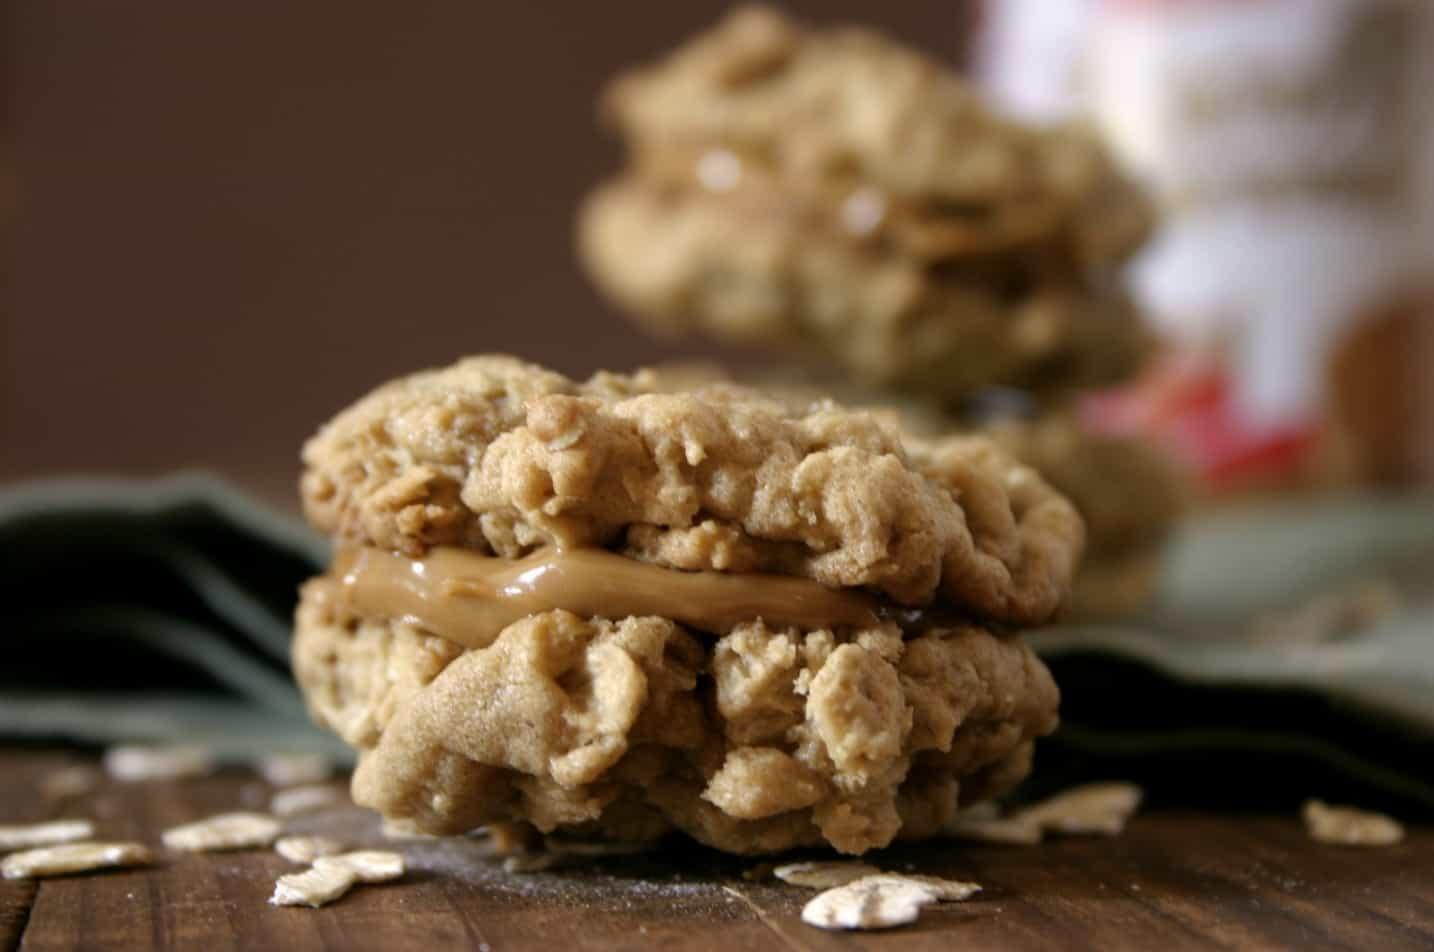 biscoff oatmeal cookies 4 1024x679 Biscoff Oatmeal Sandwich Cookies